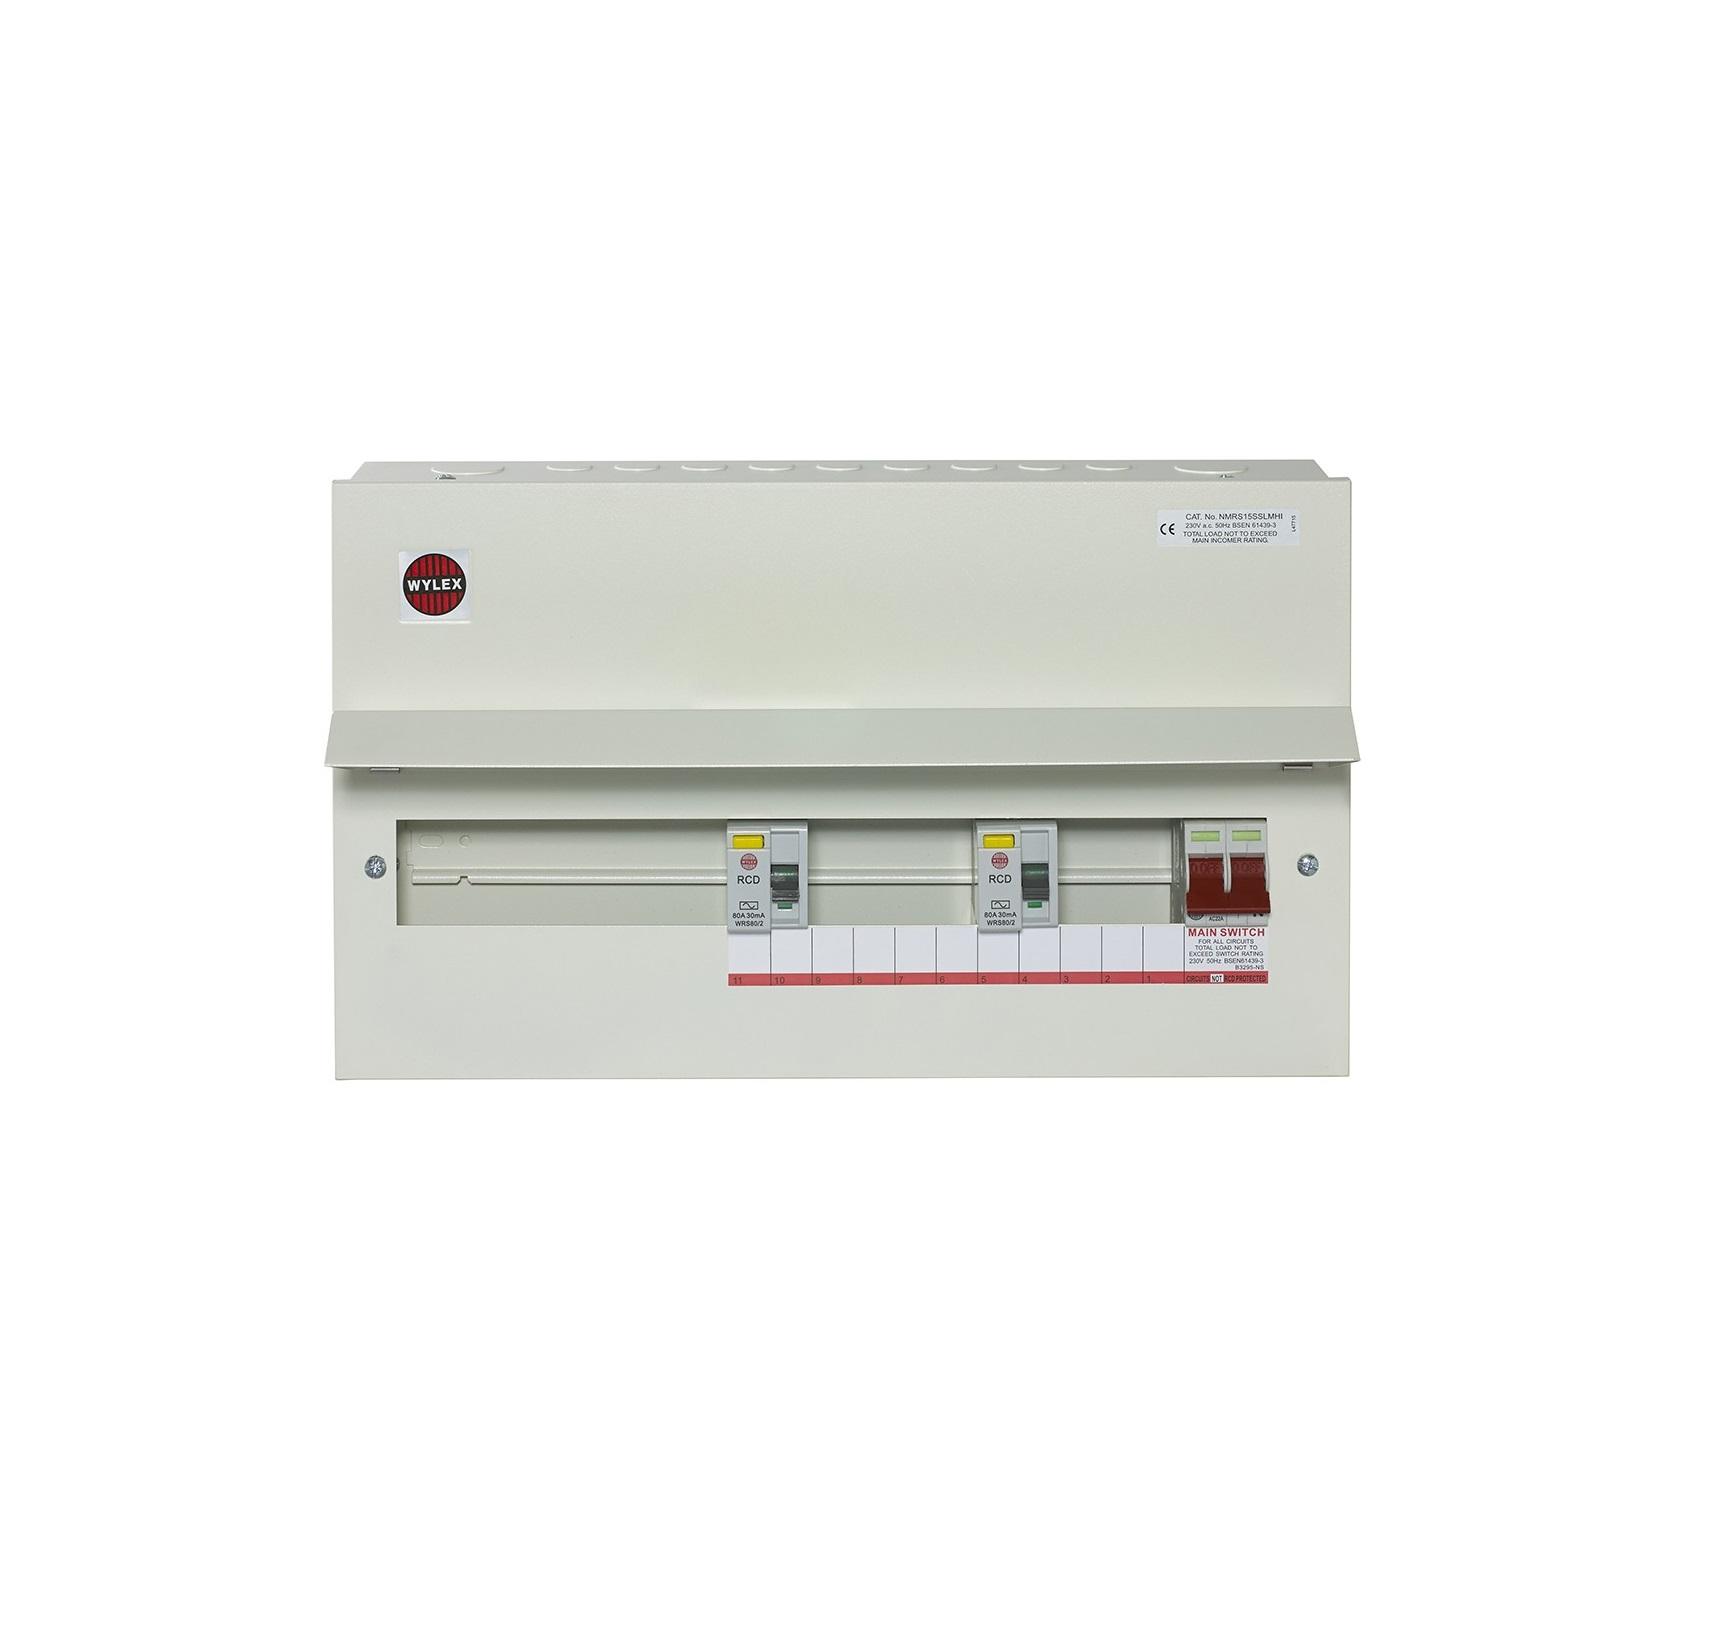 mk dual rcd consumer unit wiring diagram simple room wylex nmrs15sslmhi 15 way 100a dp main